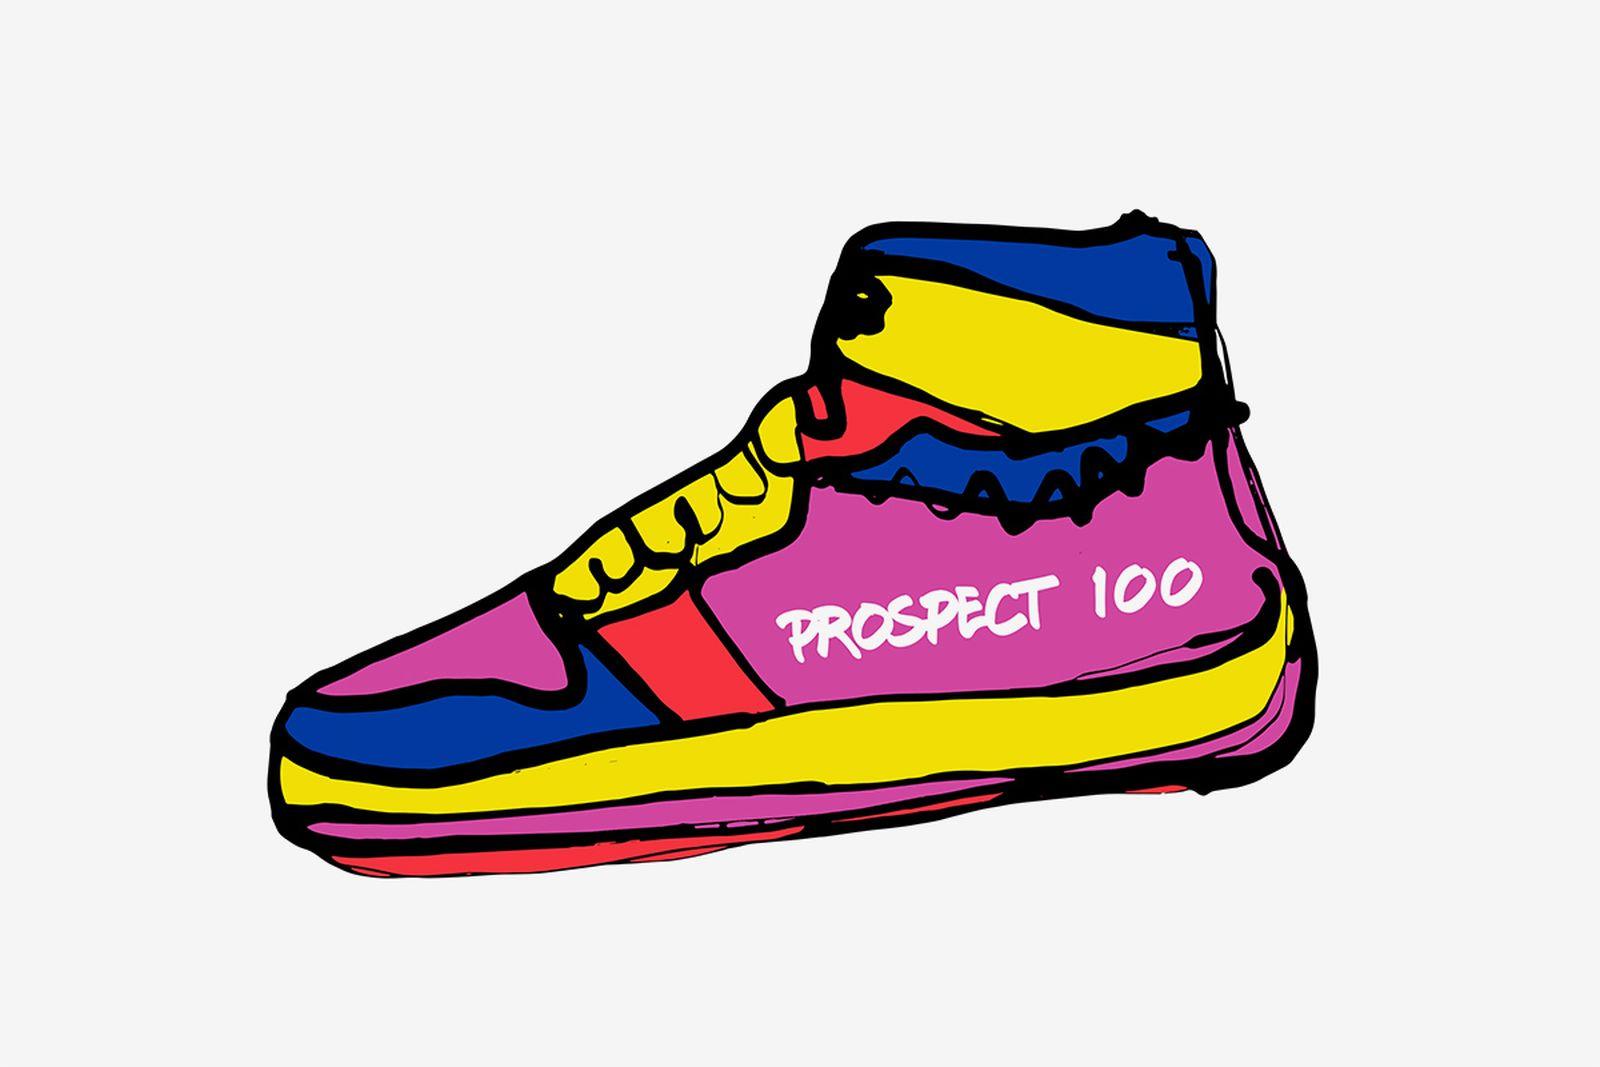 Prospect 100 Sneaker Design Competition